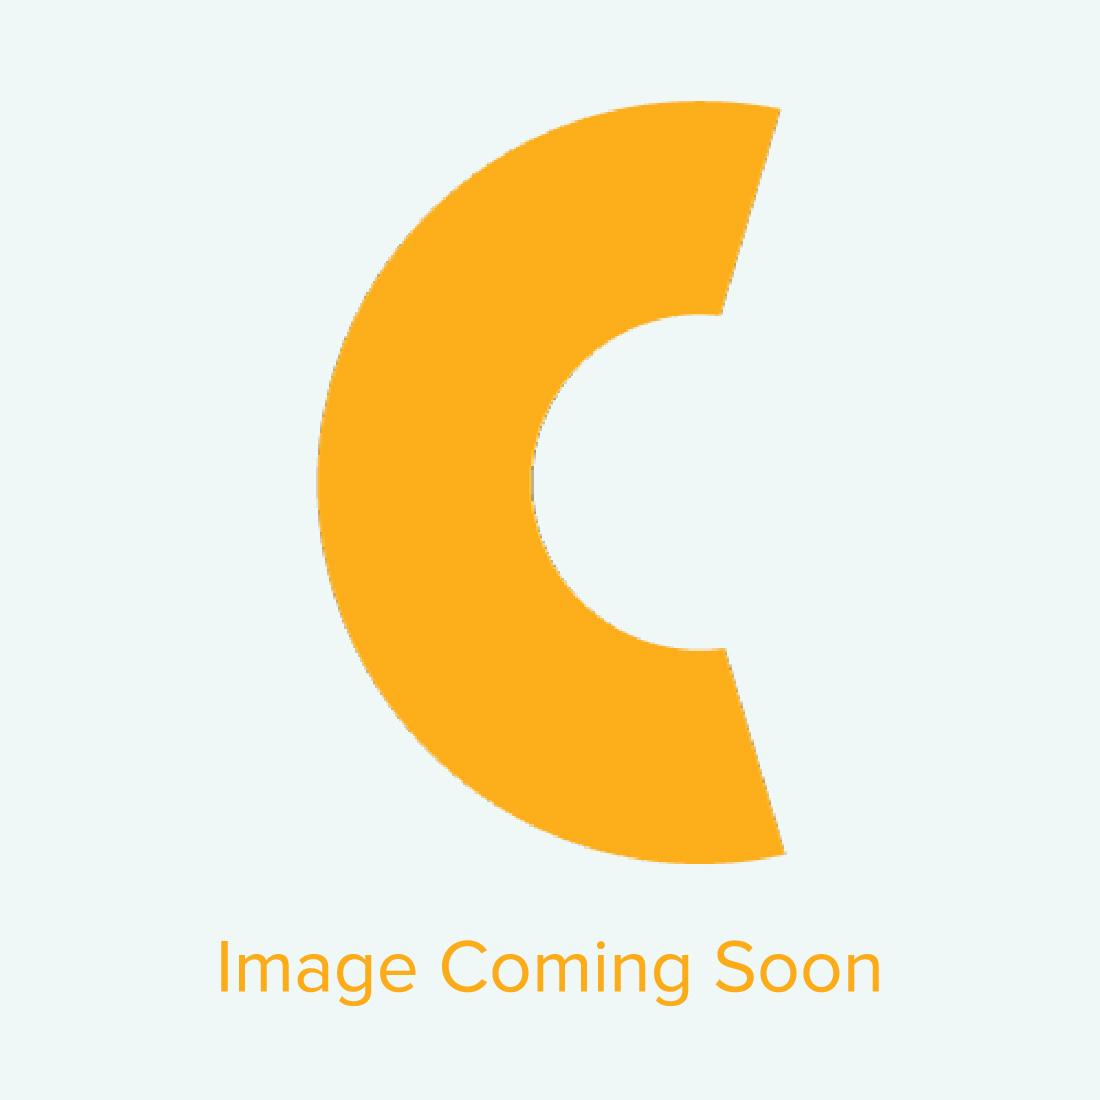 Interchangeable Platens for MAXX/Hotronix Cap Heat Press